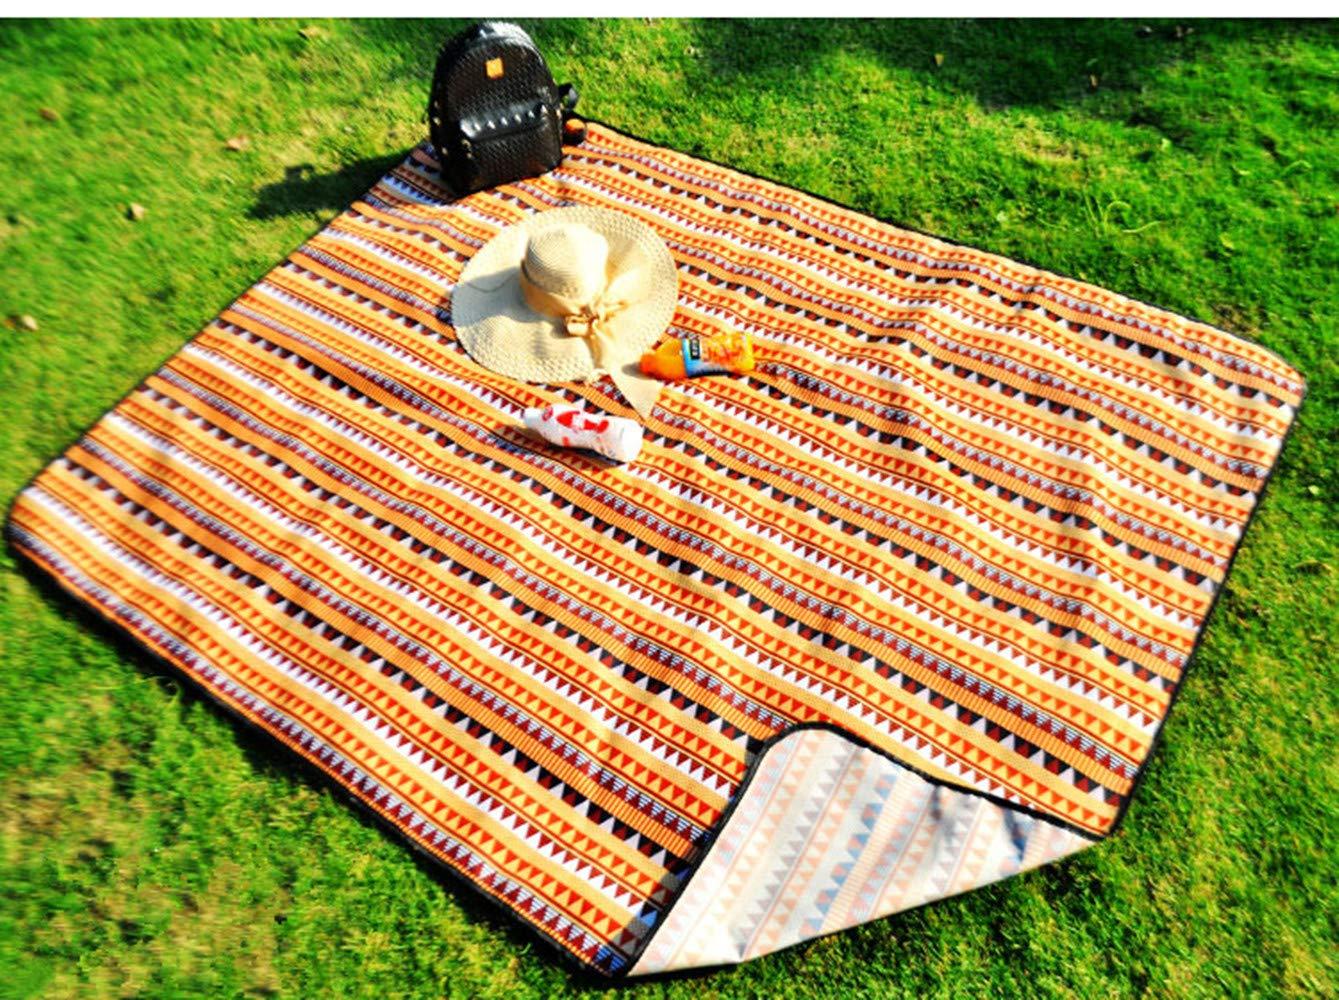 Zhbotaolang Camping Picknickdecke Draussen Strand Strand Strand Ultra Leichtgewicht Wasserdicht Familientag Aktivitäten Teppich AF L B07MFJWFFY Picknickdecken Elegant 68e477